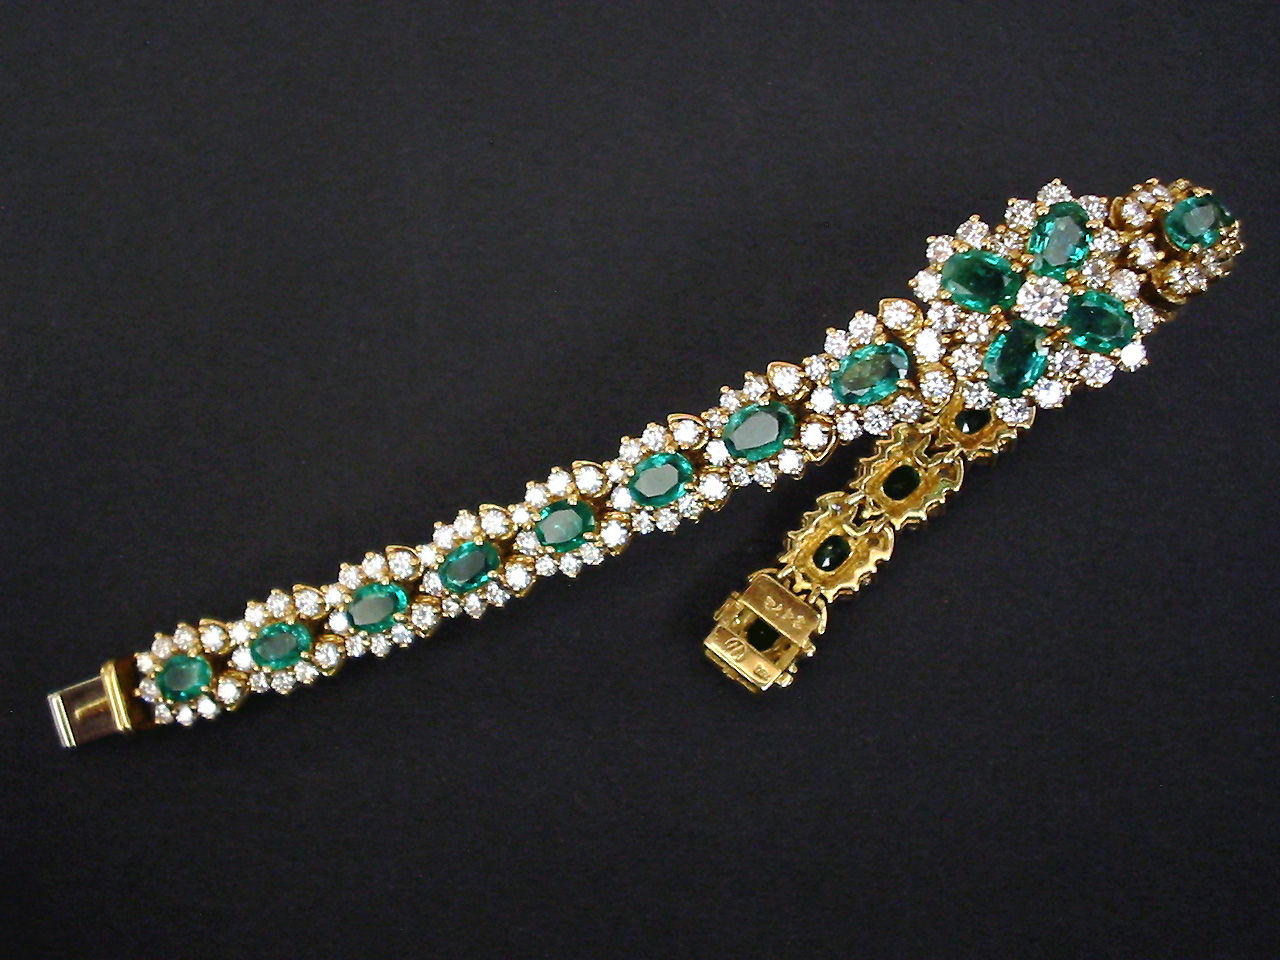 to wear - Winston Harry bracelets for women pictures video